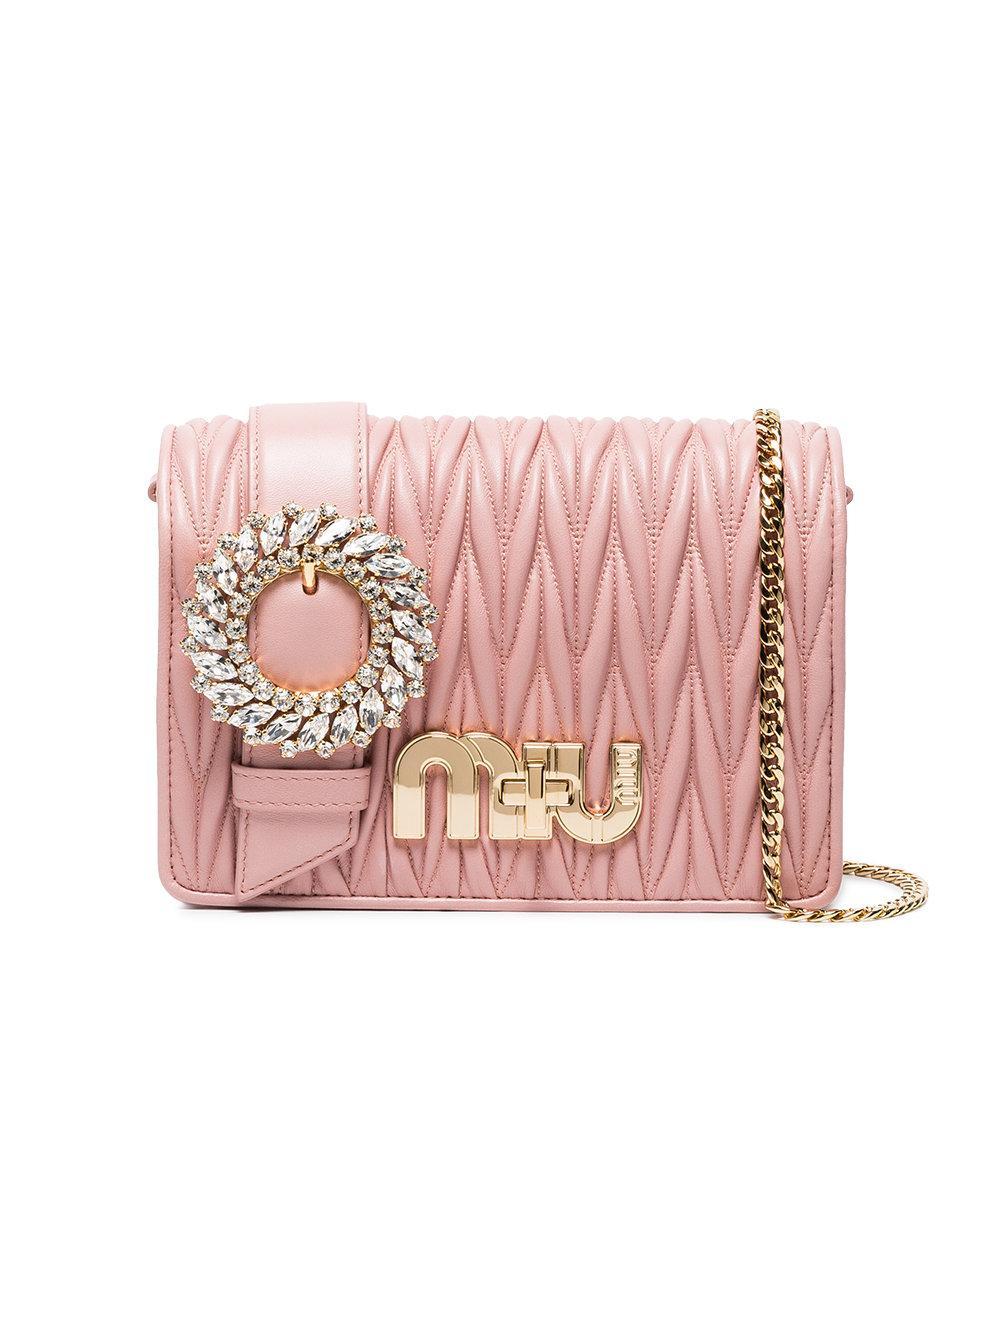 ff139619a9 Miu Miu Pink Matelassé Leather Cross Body Bag